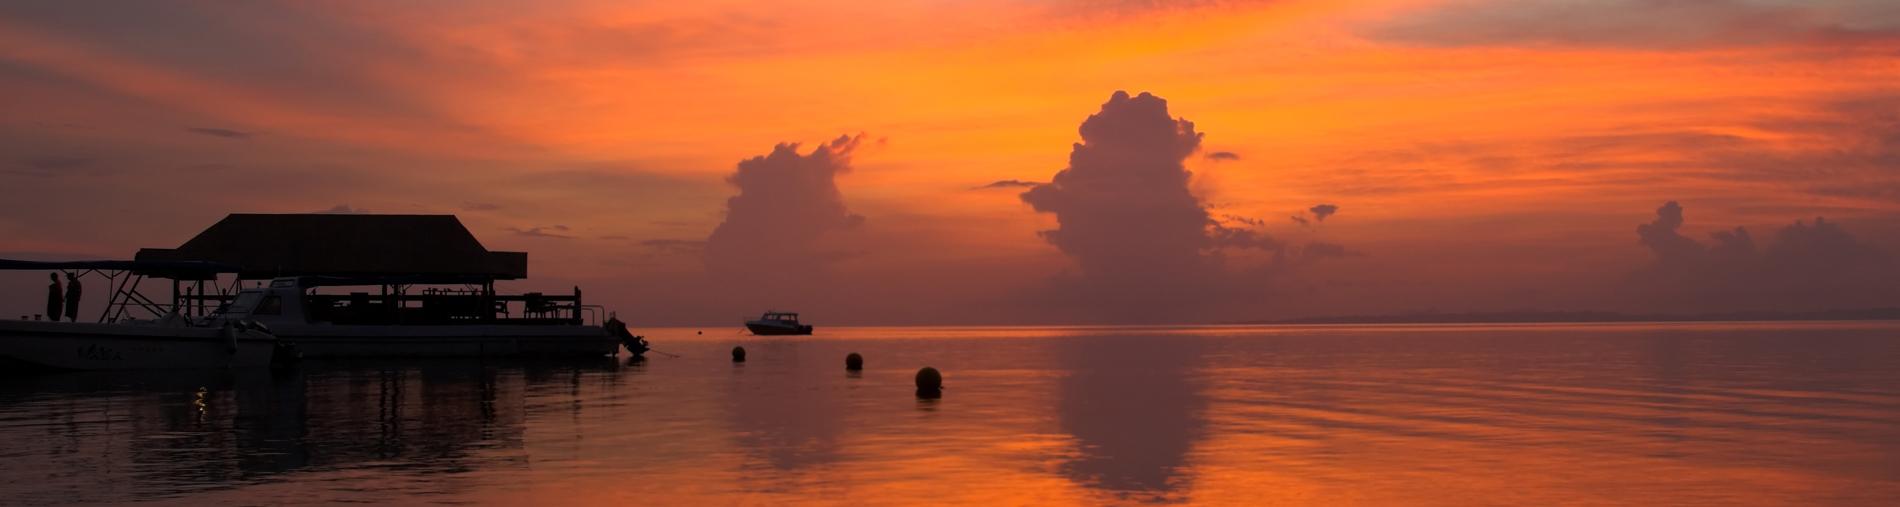 rondreis sulawesi hotels togian eiland